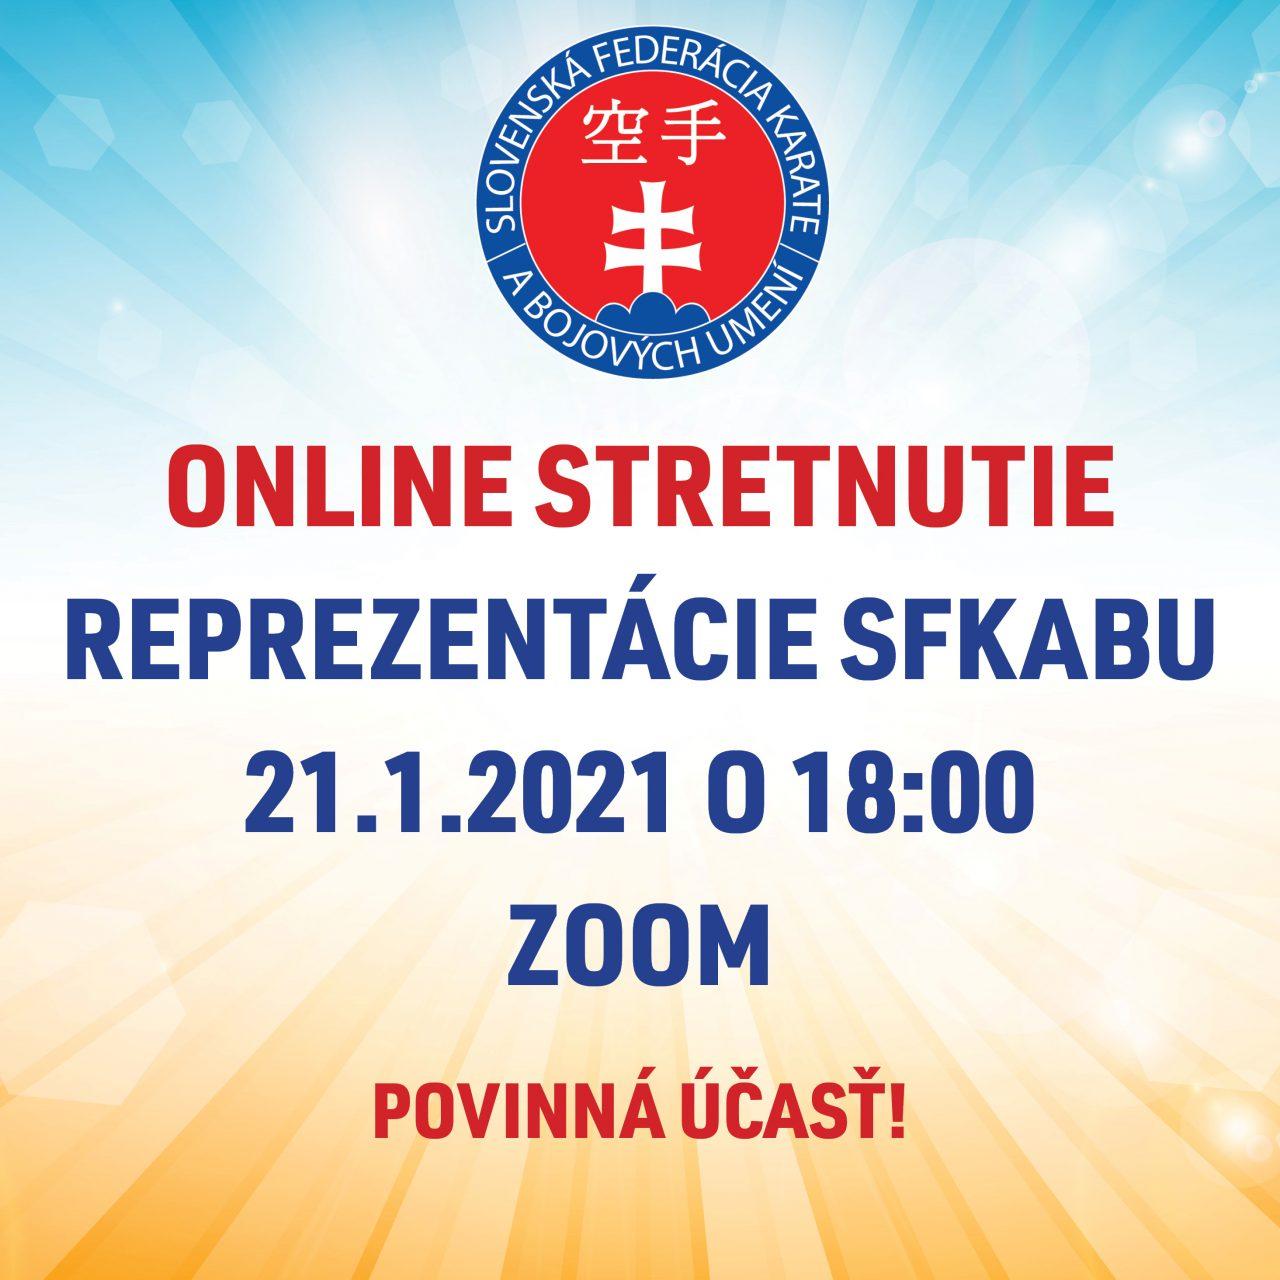 https://karate-slovakia.sk/wp-content/uploads/online-stretnutie_januar-1280x1280.jpg